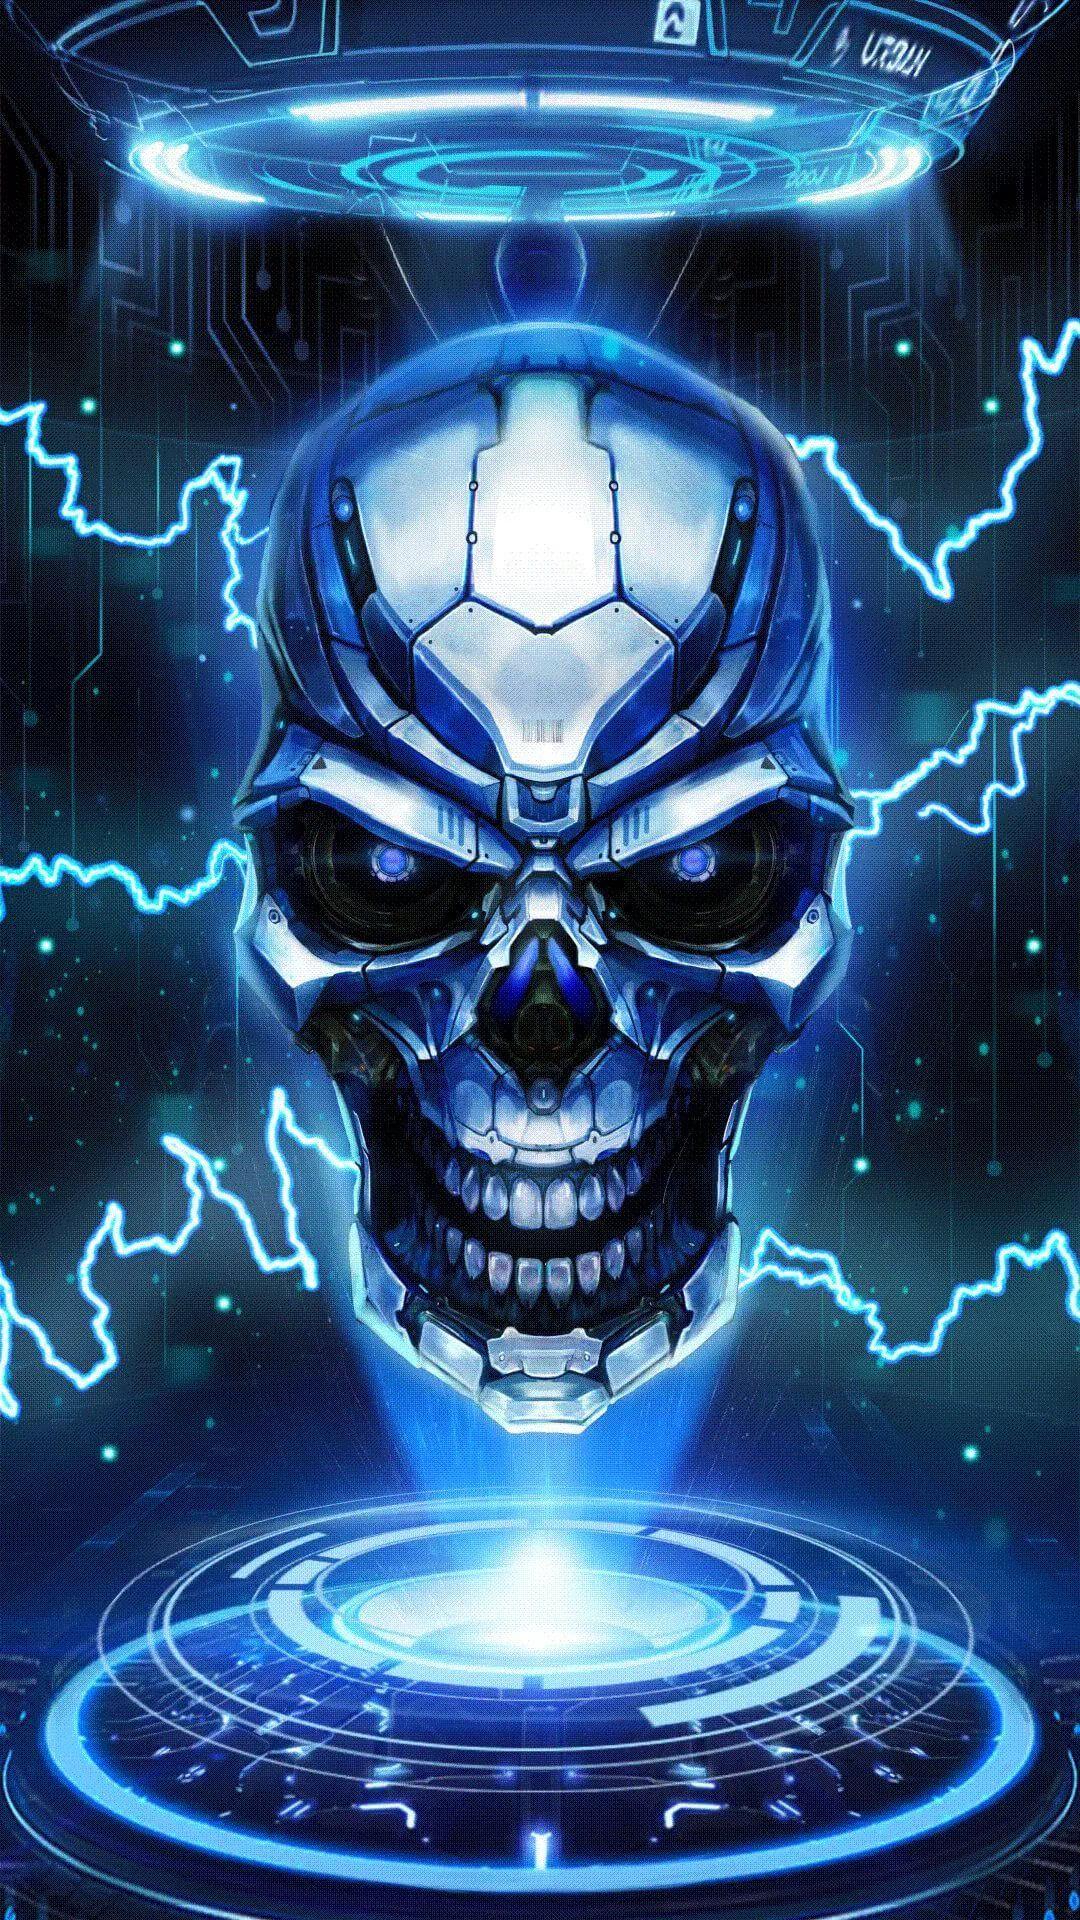 Cool Skull home screen wallpaper